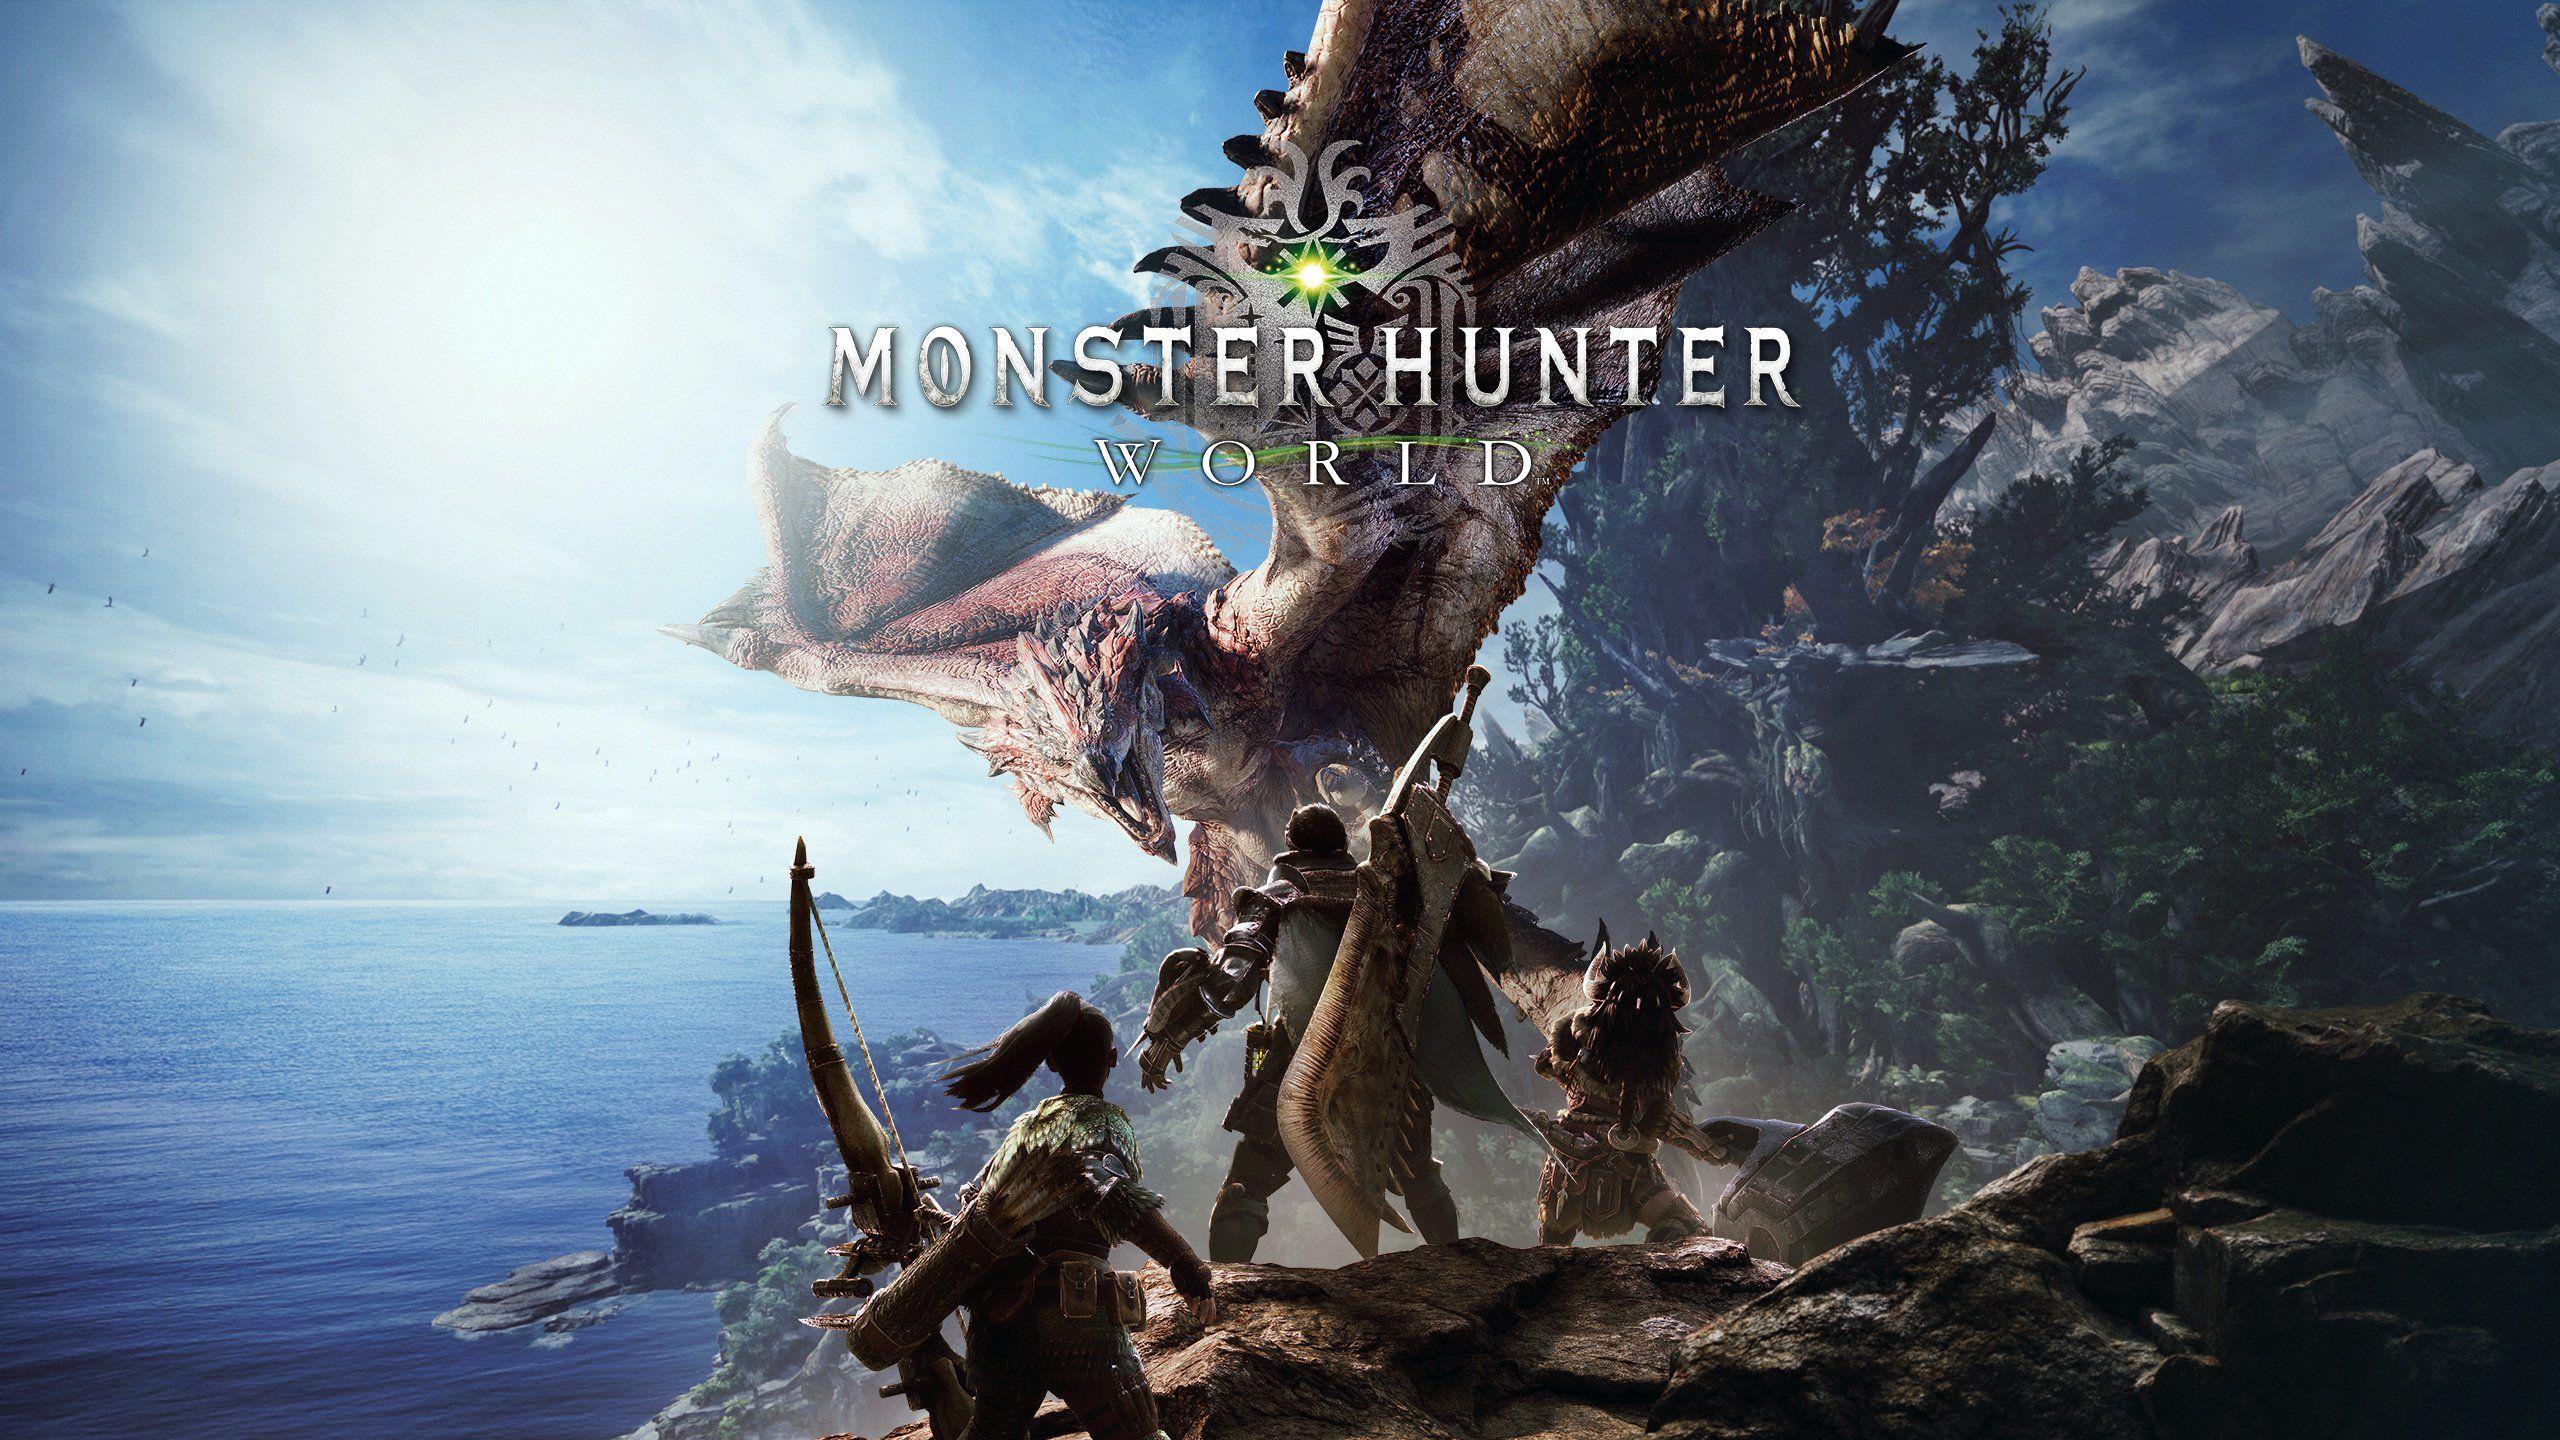 Sebelum Kalian Beli Kalian Mending Cek Dulu Spec Yang Diperlukan Disini Xd Monster Hunter Monster Game Pc